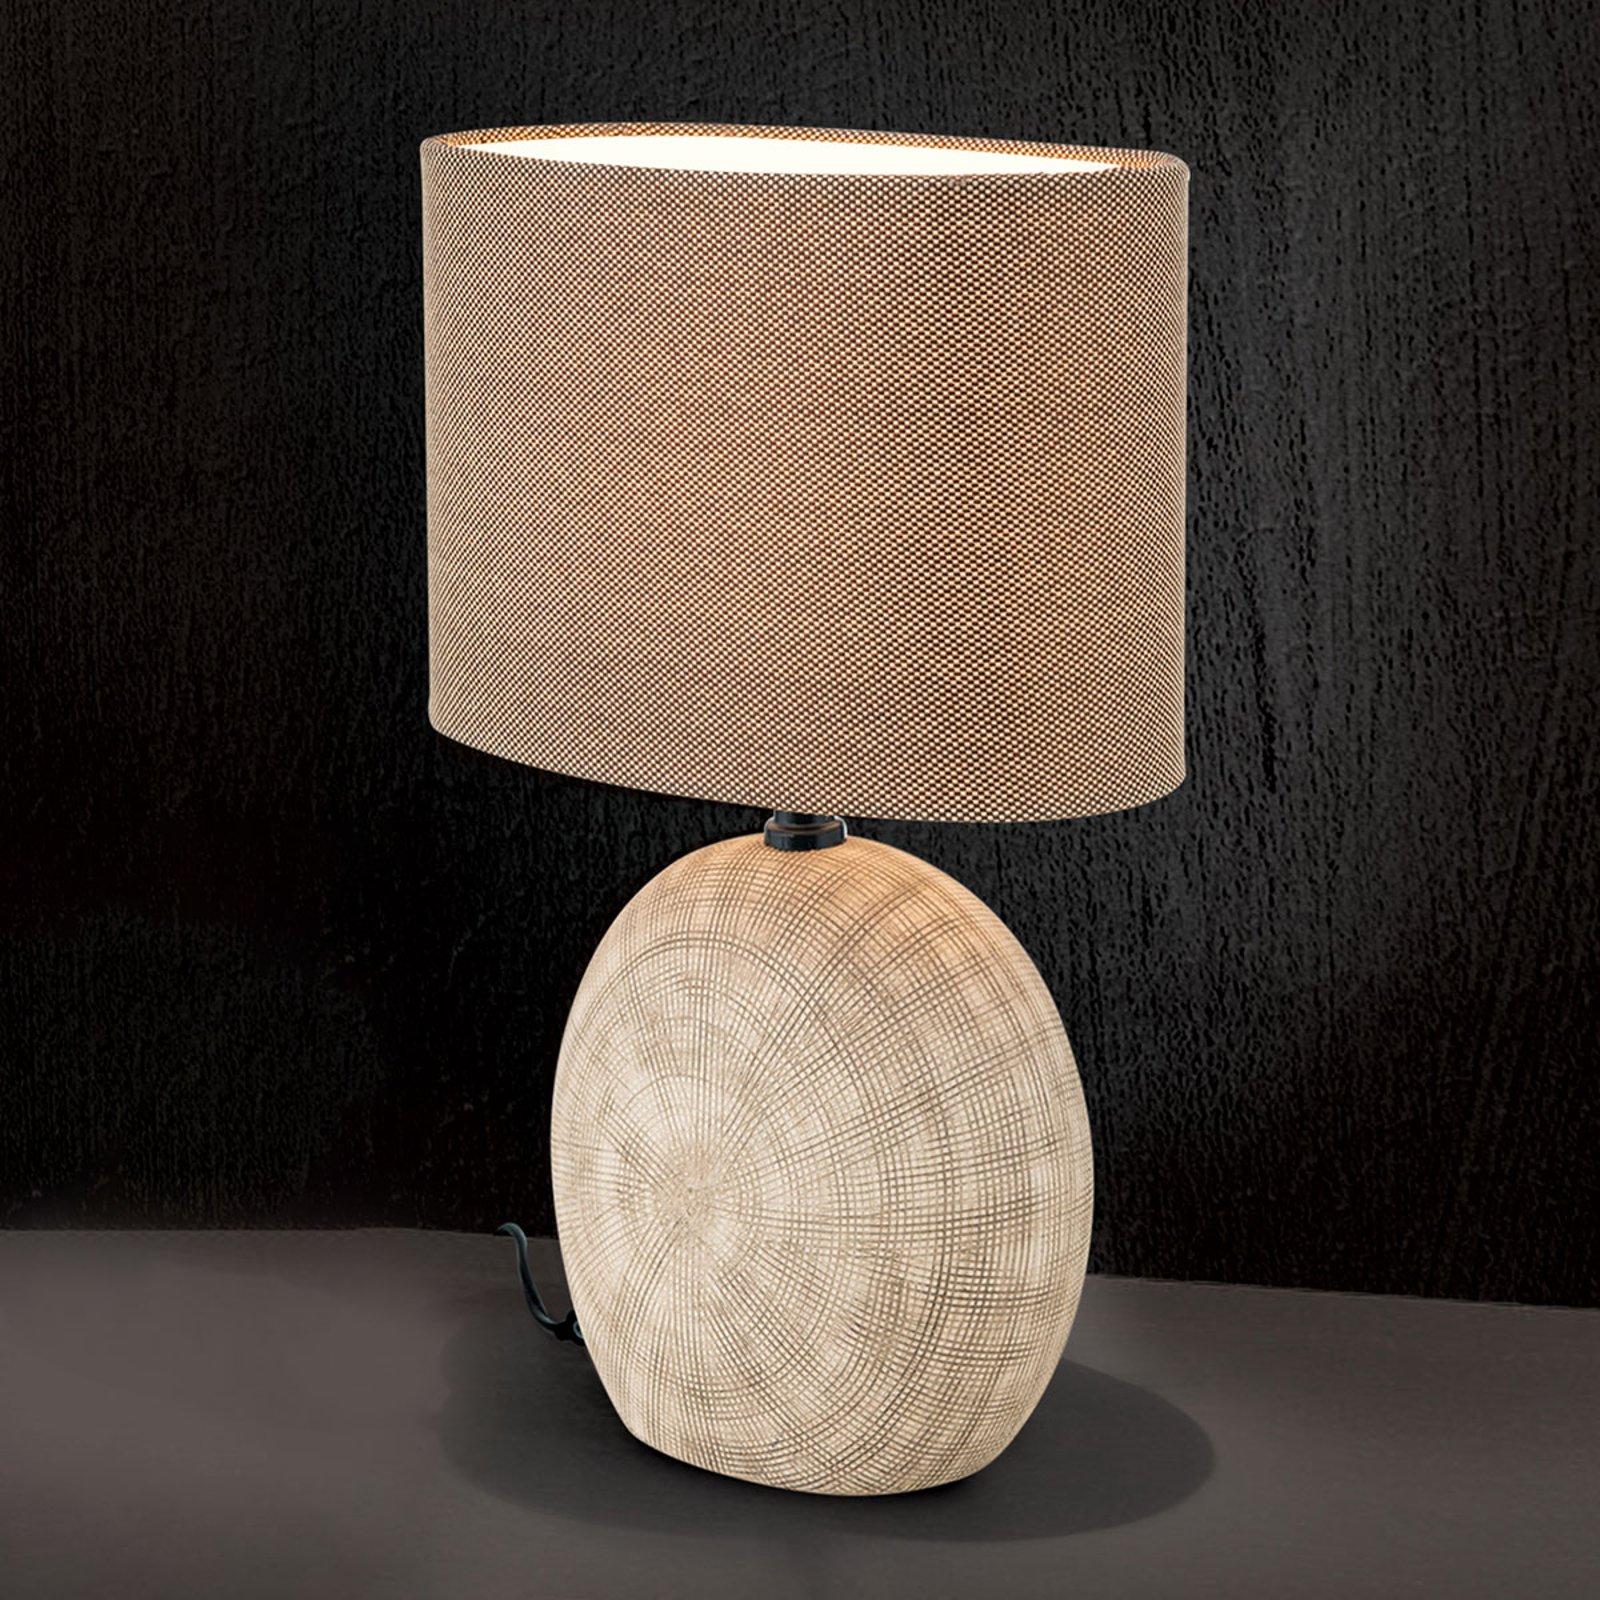 Keramisk bordlampe Ethno 52 cm brun, fot cotto